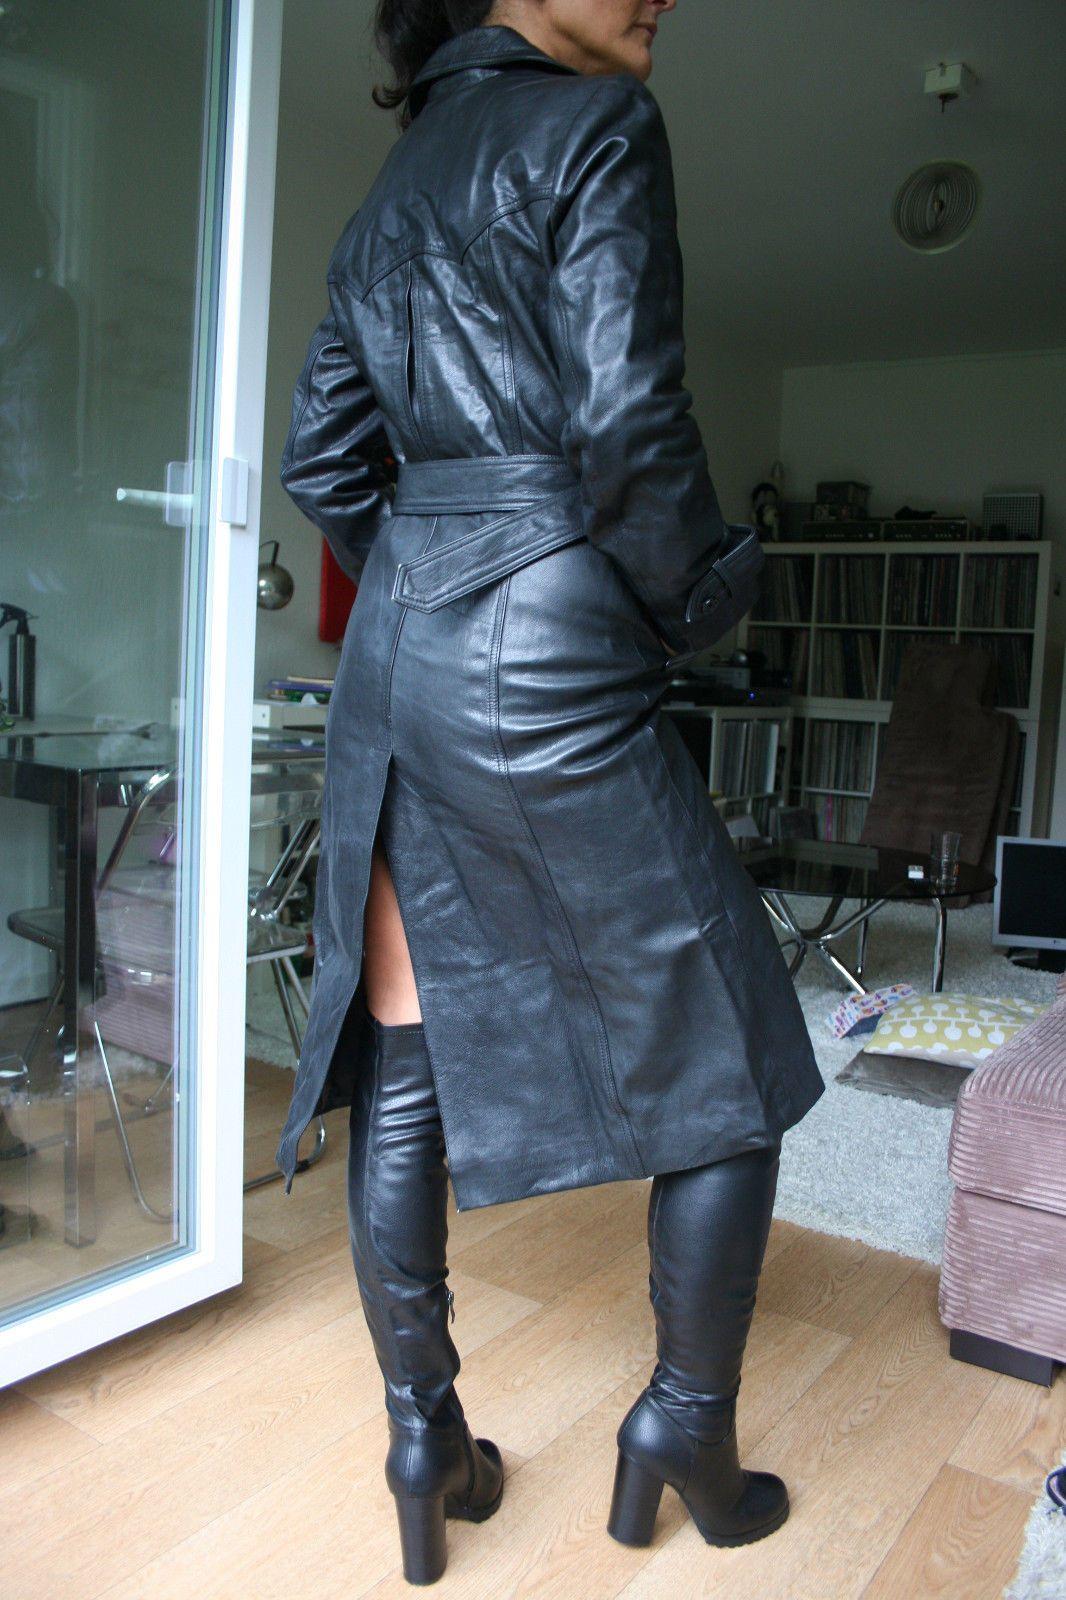 Ledermantel von Hennes, Gr. 36, schwarz   eBay   Lovely coats ... fc95f77644